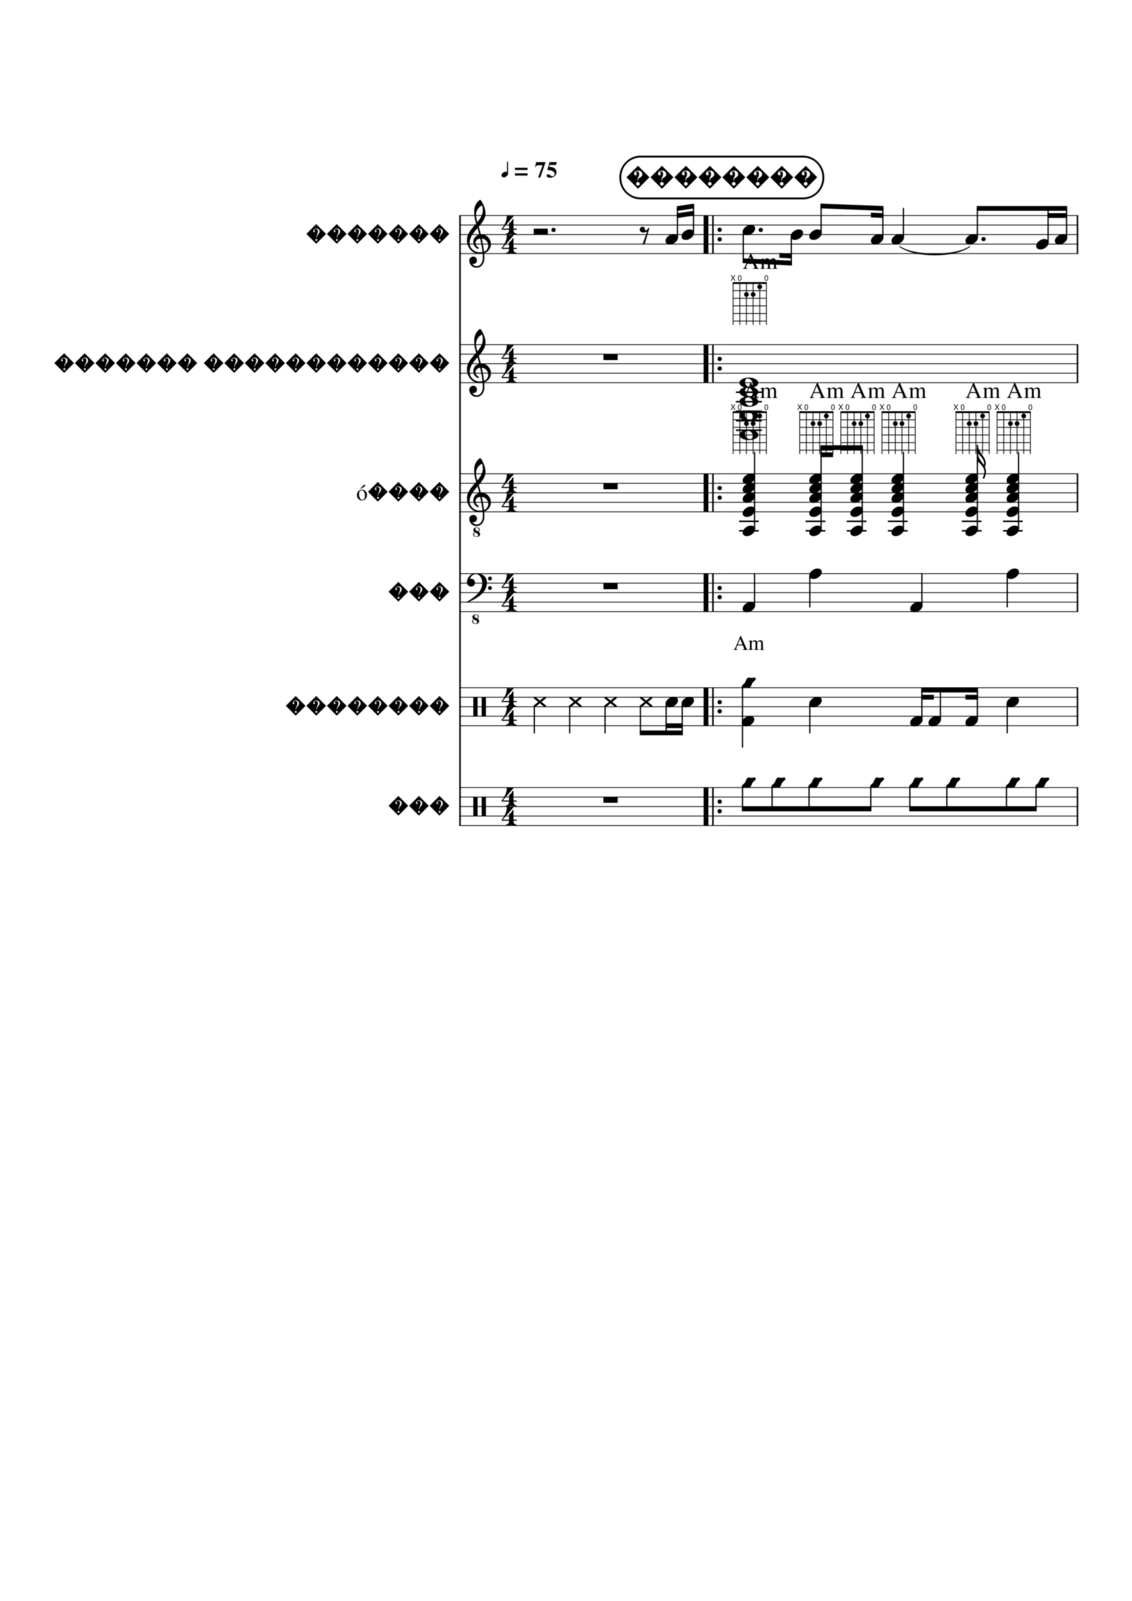 CHujina slide, Image 1